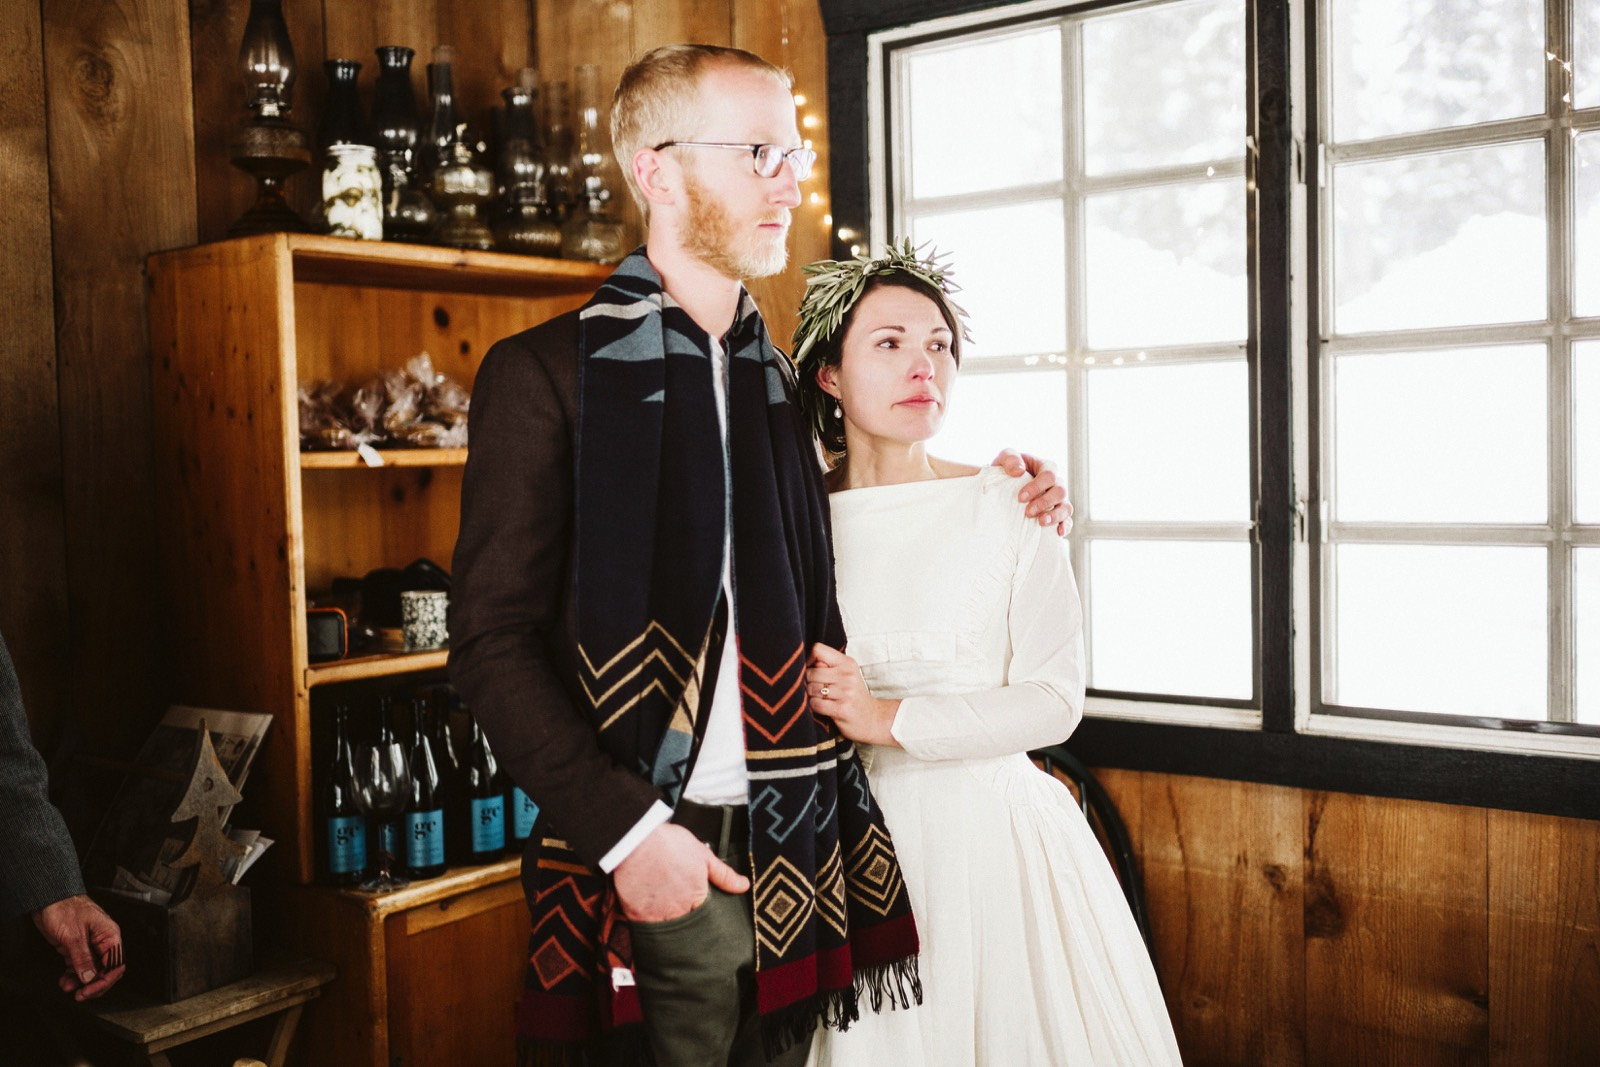 alpine-lakes-high-camp-winter-wedding-83 ALPINE LAKES HIGH CAMP WEDDING